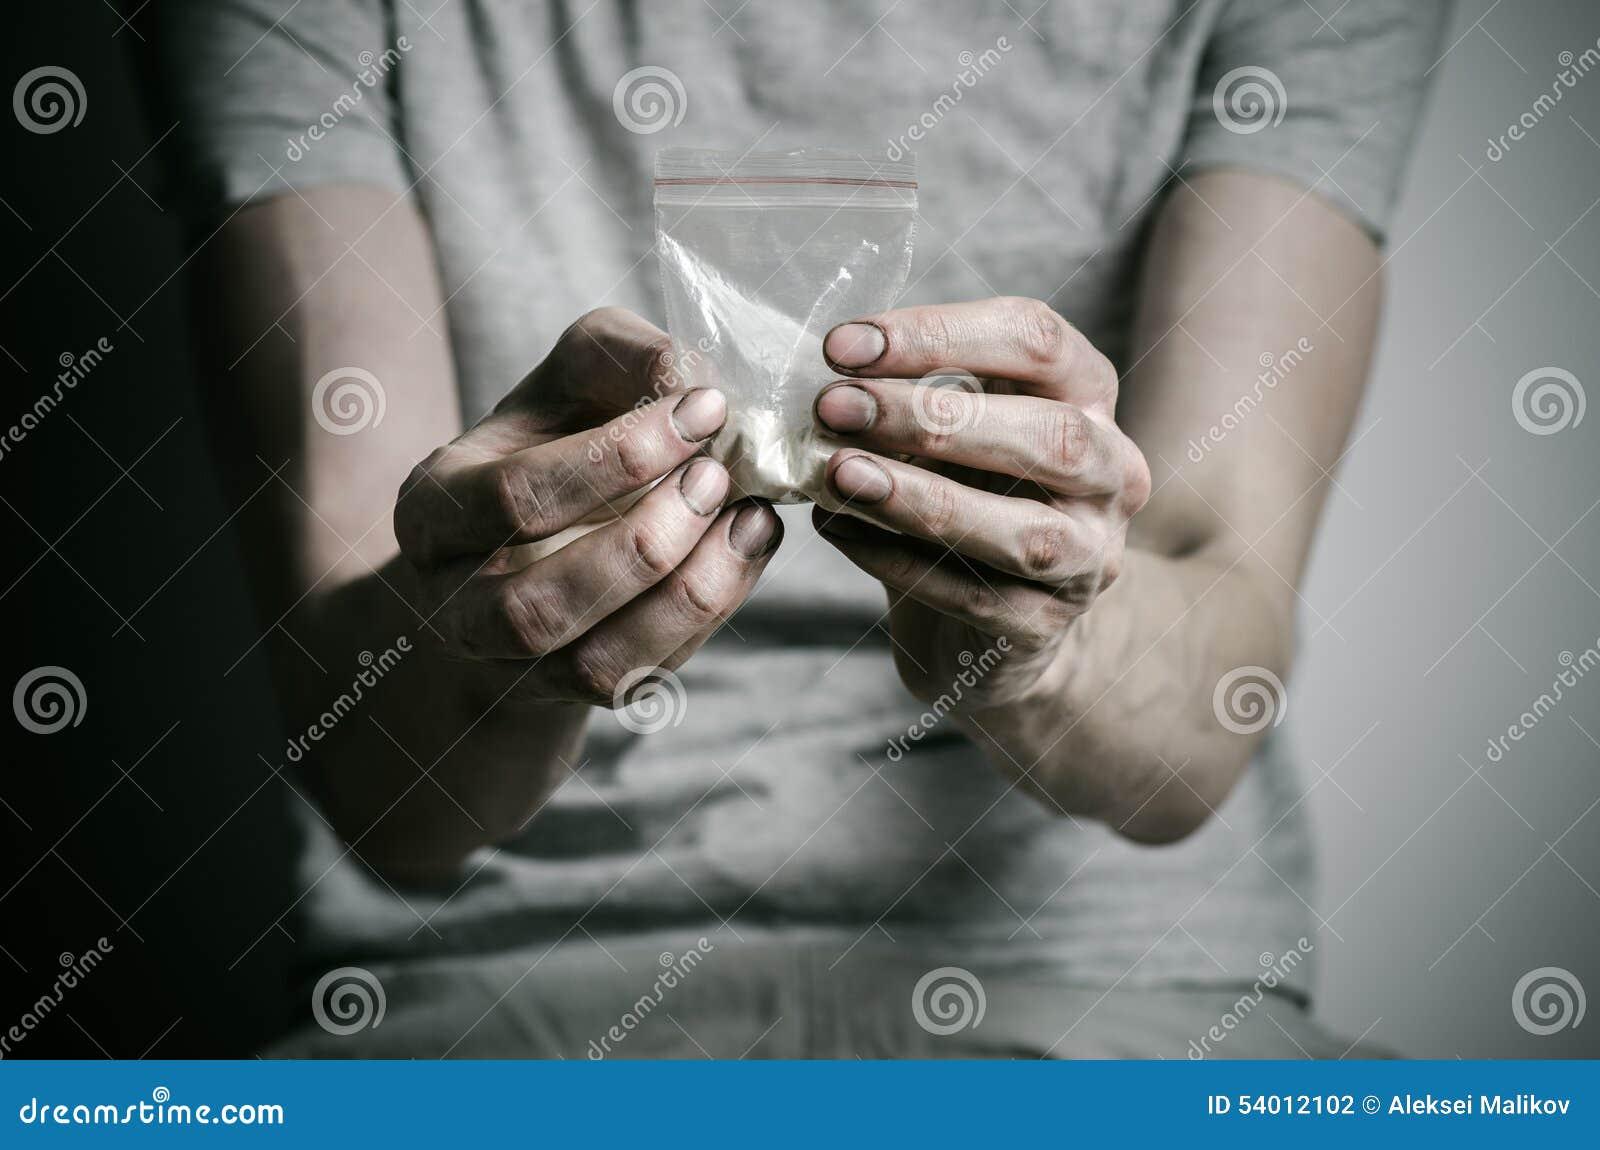 drug addiction topics